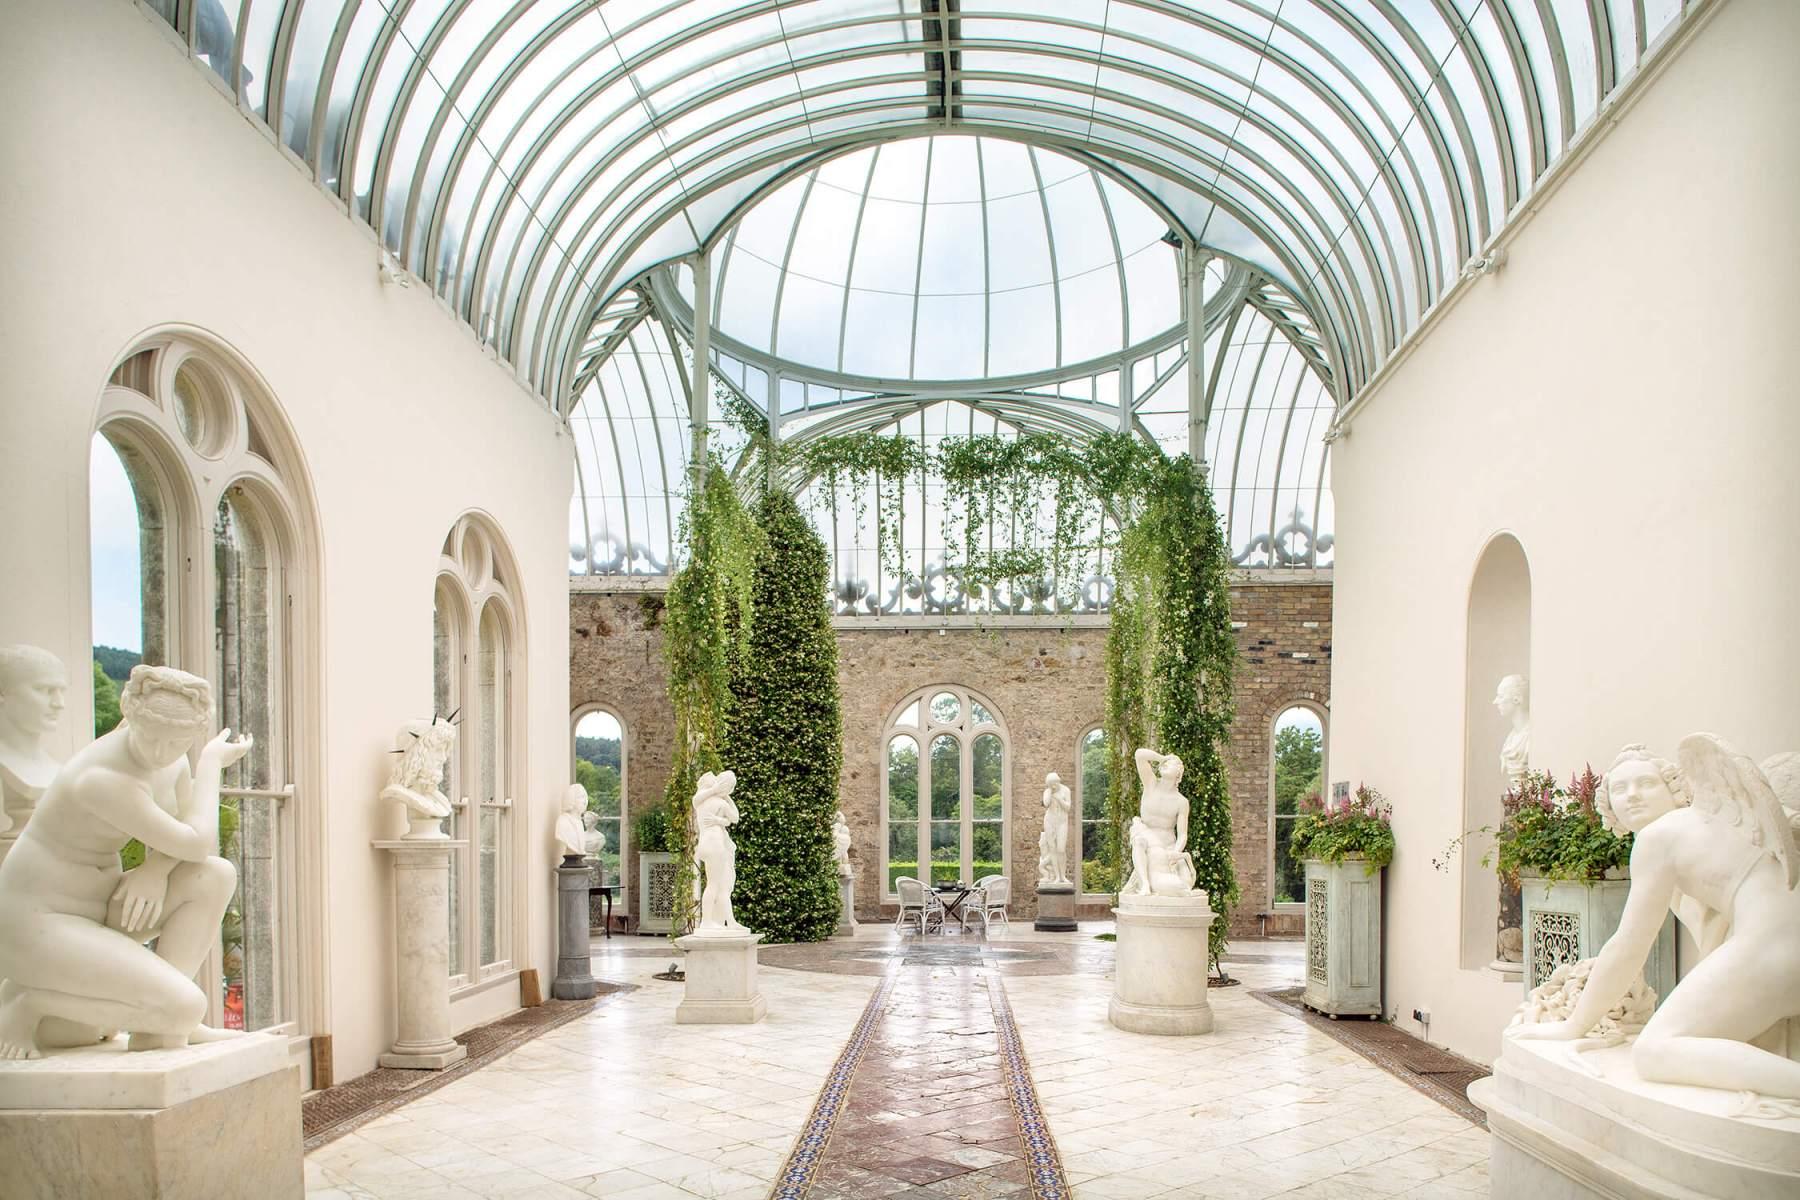 Kilruddery-interior-Orangerie